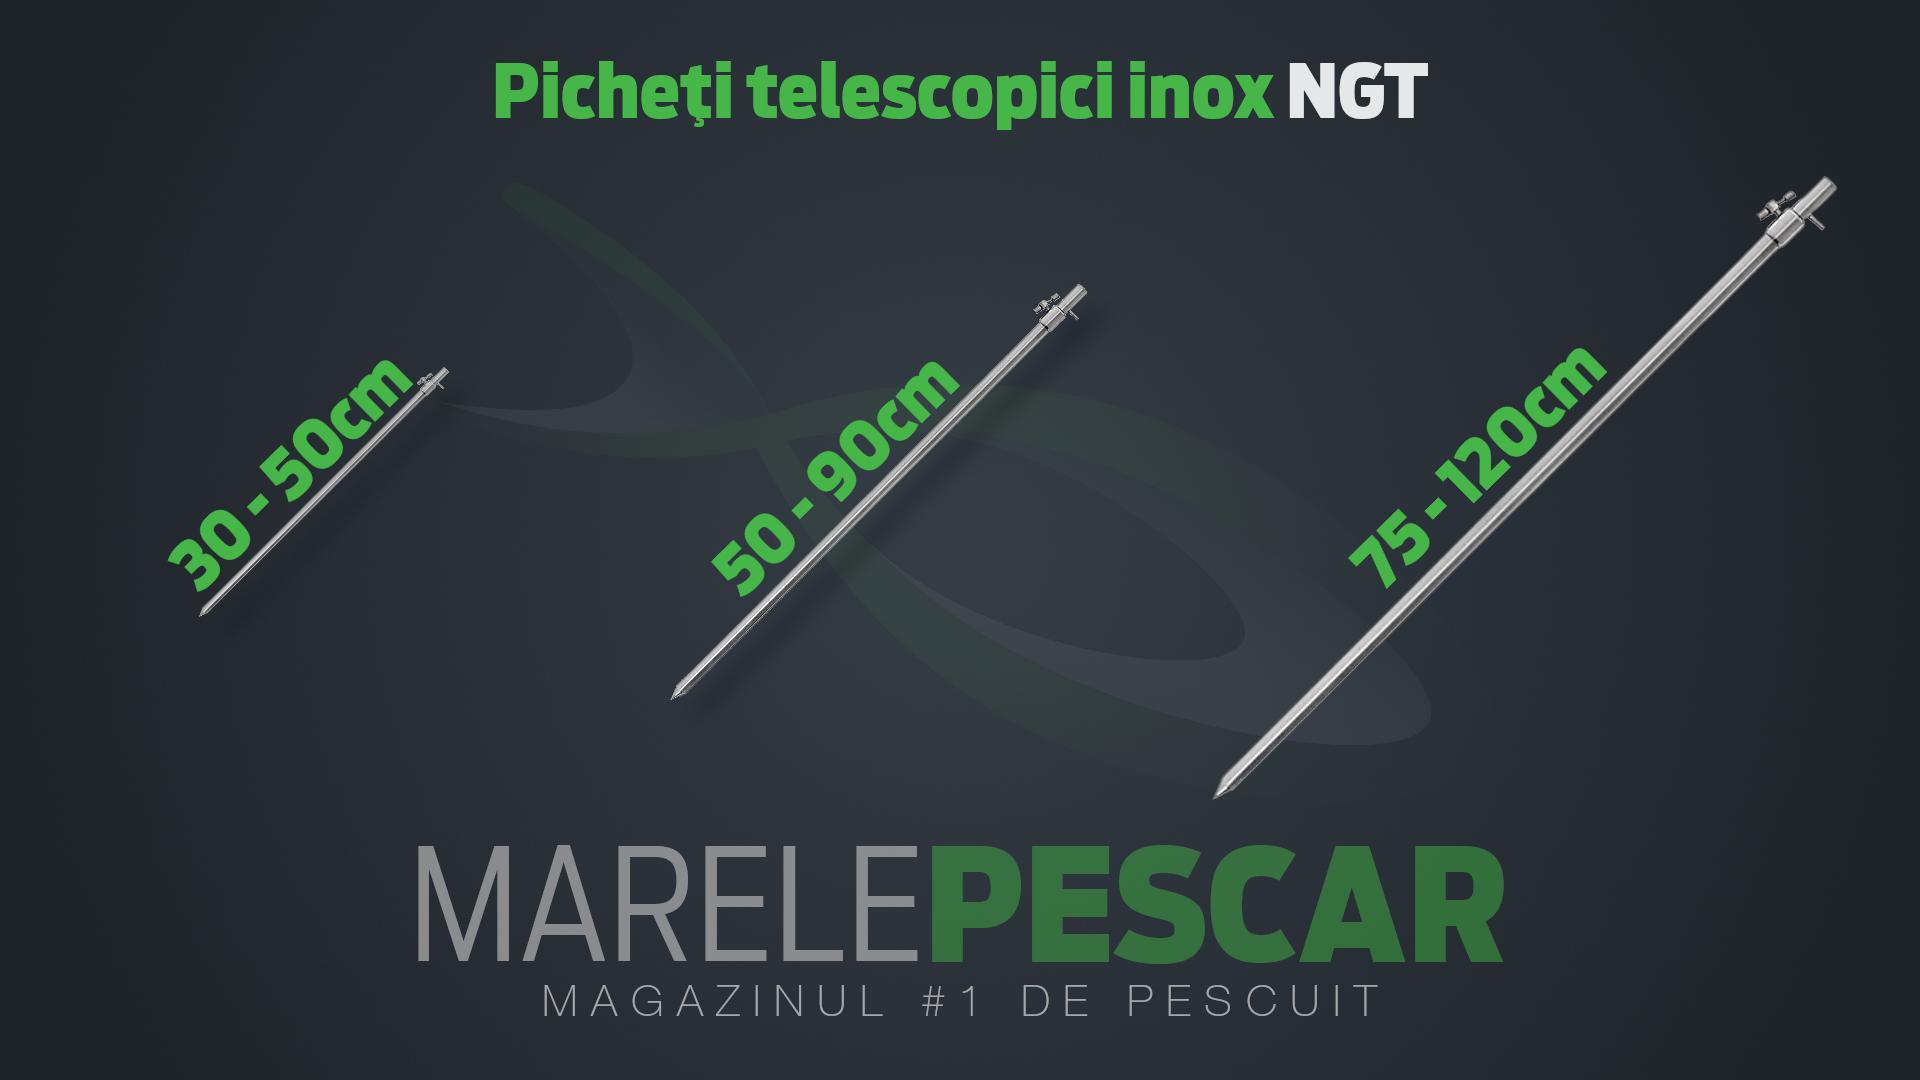 Picheți telescopici inox NGT